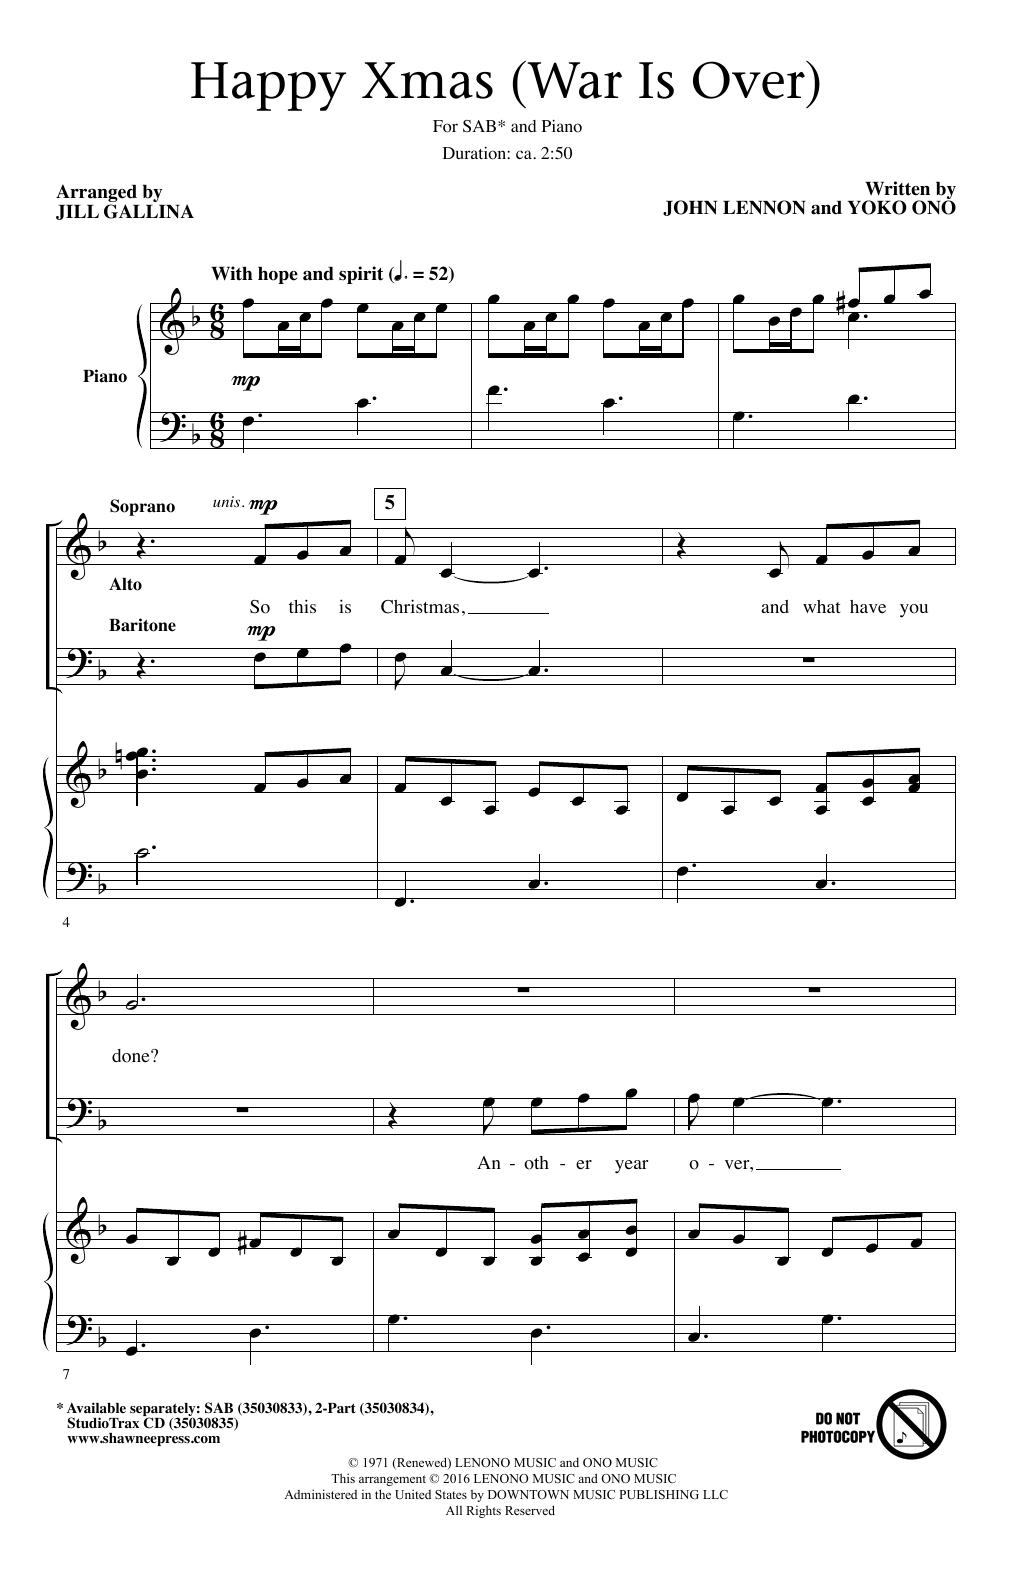 Happy Christmas War Is Over Chords.Jill Gallina Happy Xmas War Is Over Sheet Music Notes Chords Download Printable 2 Part Choir Sku 195638